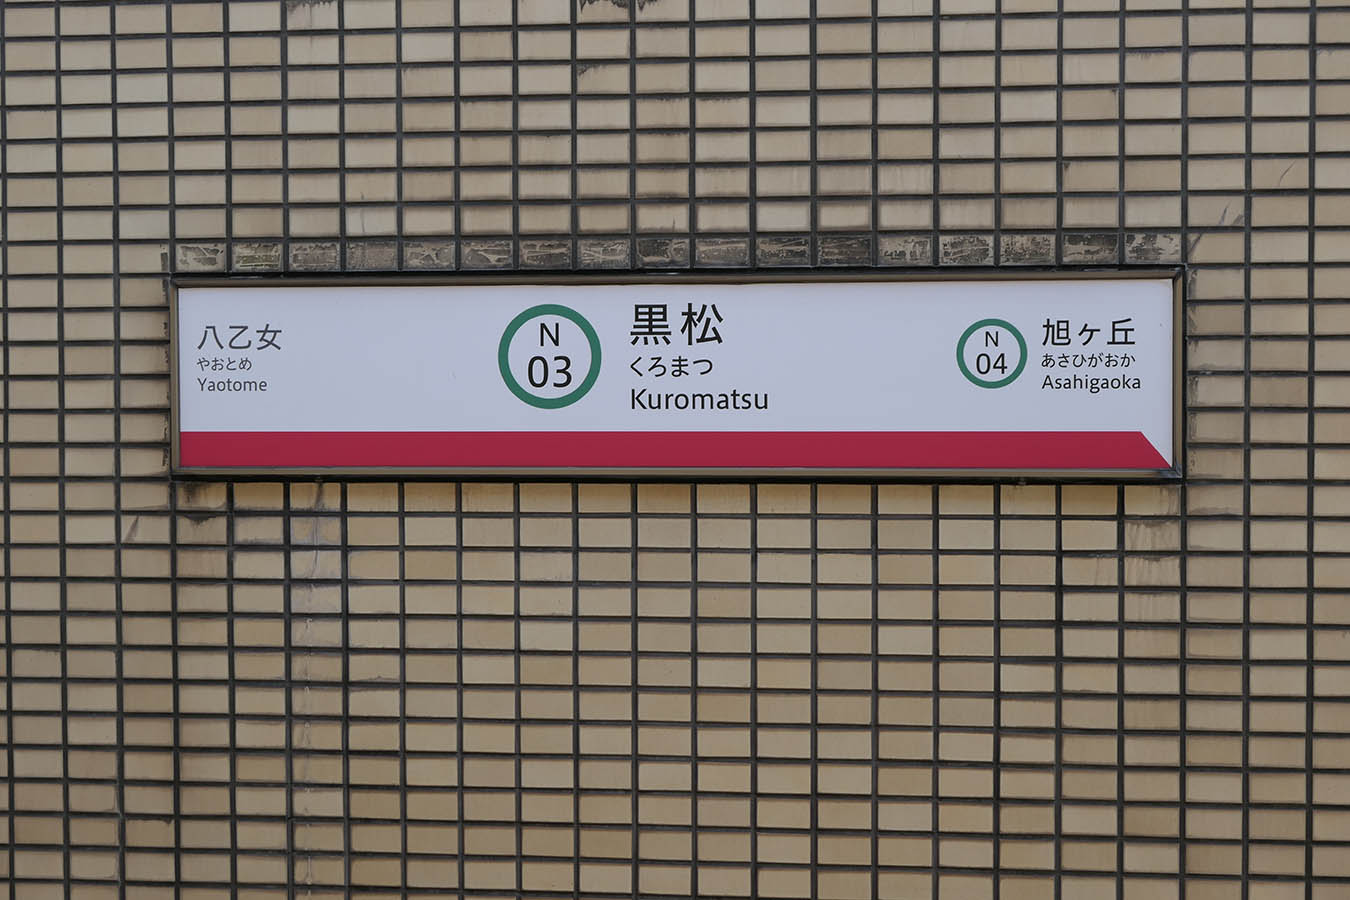 SS-N03_photo03.jpg